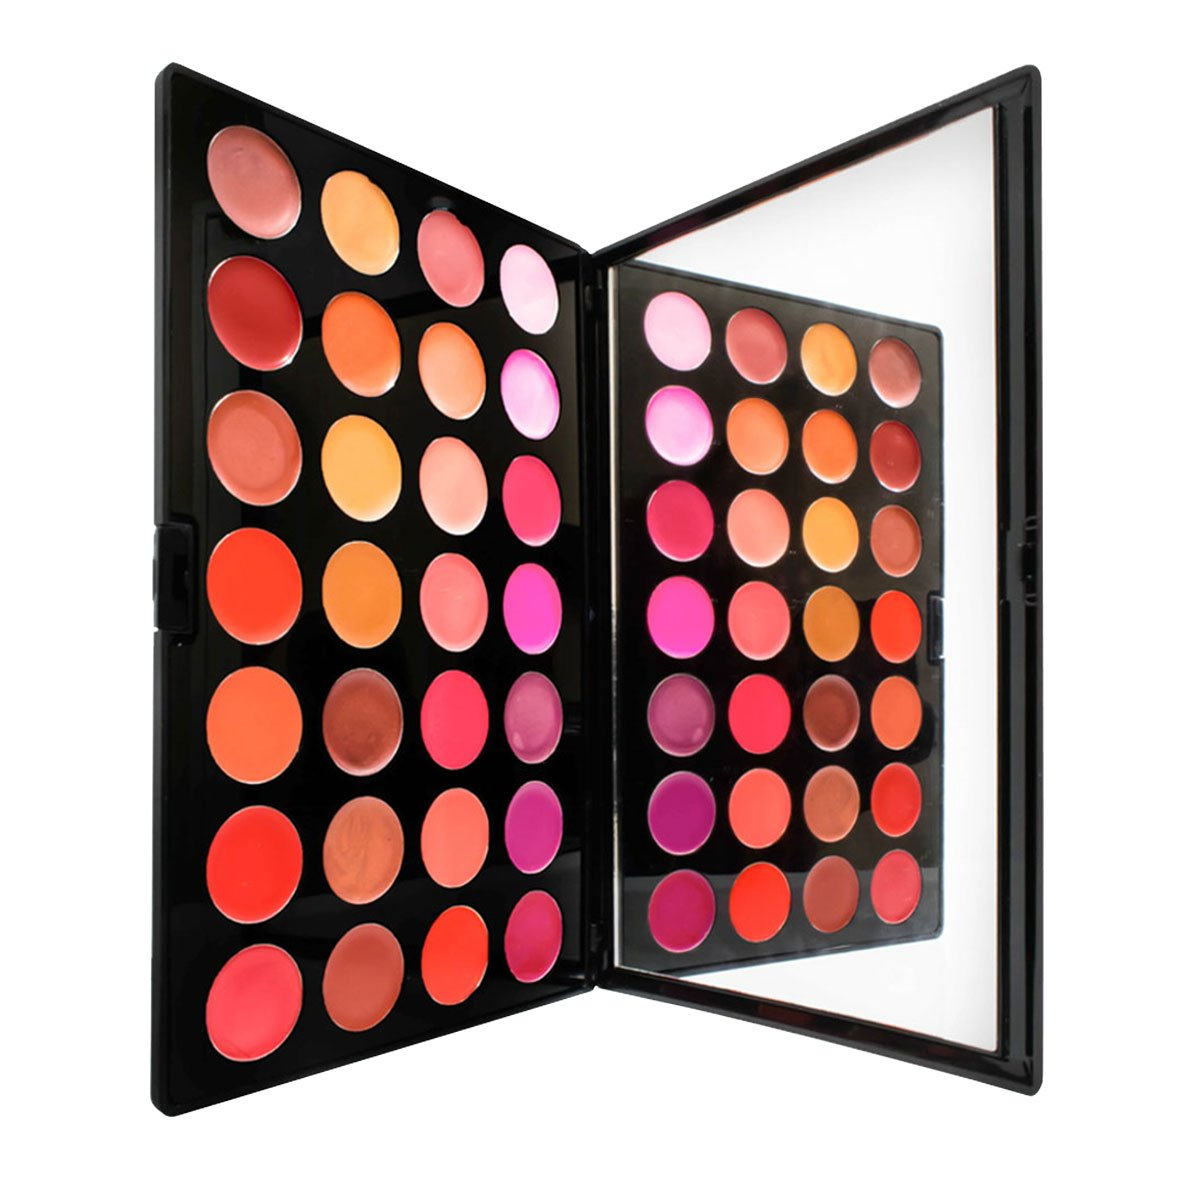 Lipstick Palette by Sacha Cosmetics, Professional Moisturizing Long Lasting Lip Stick Kit, Color Intense Makeup for All Skin Tones